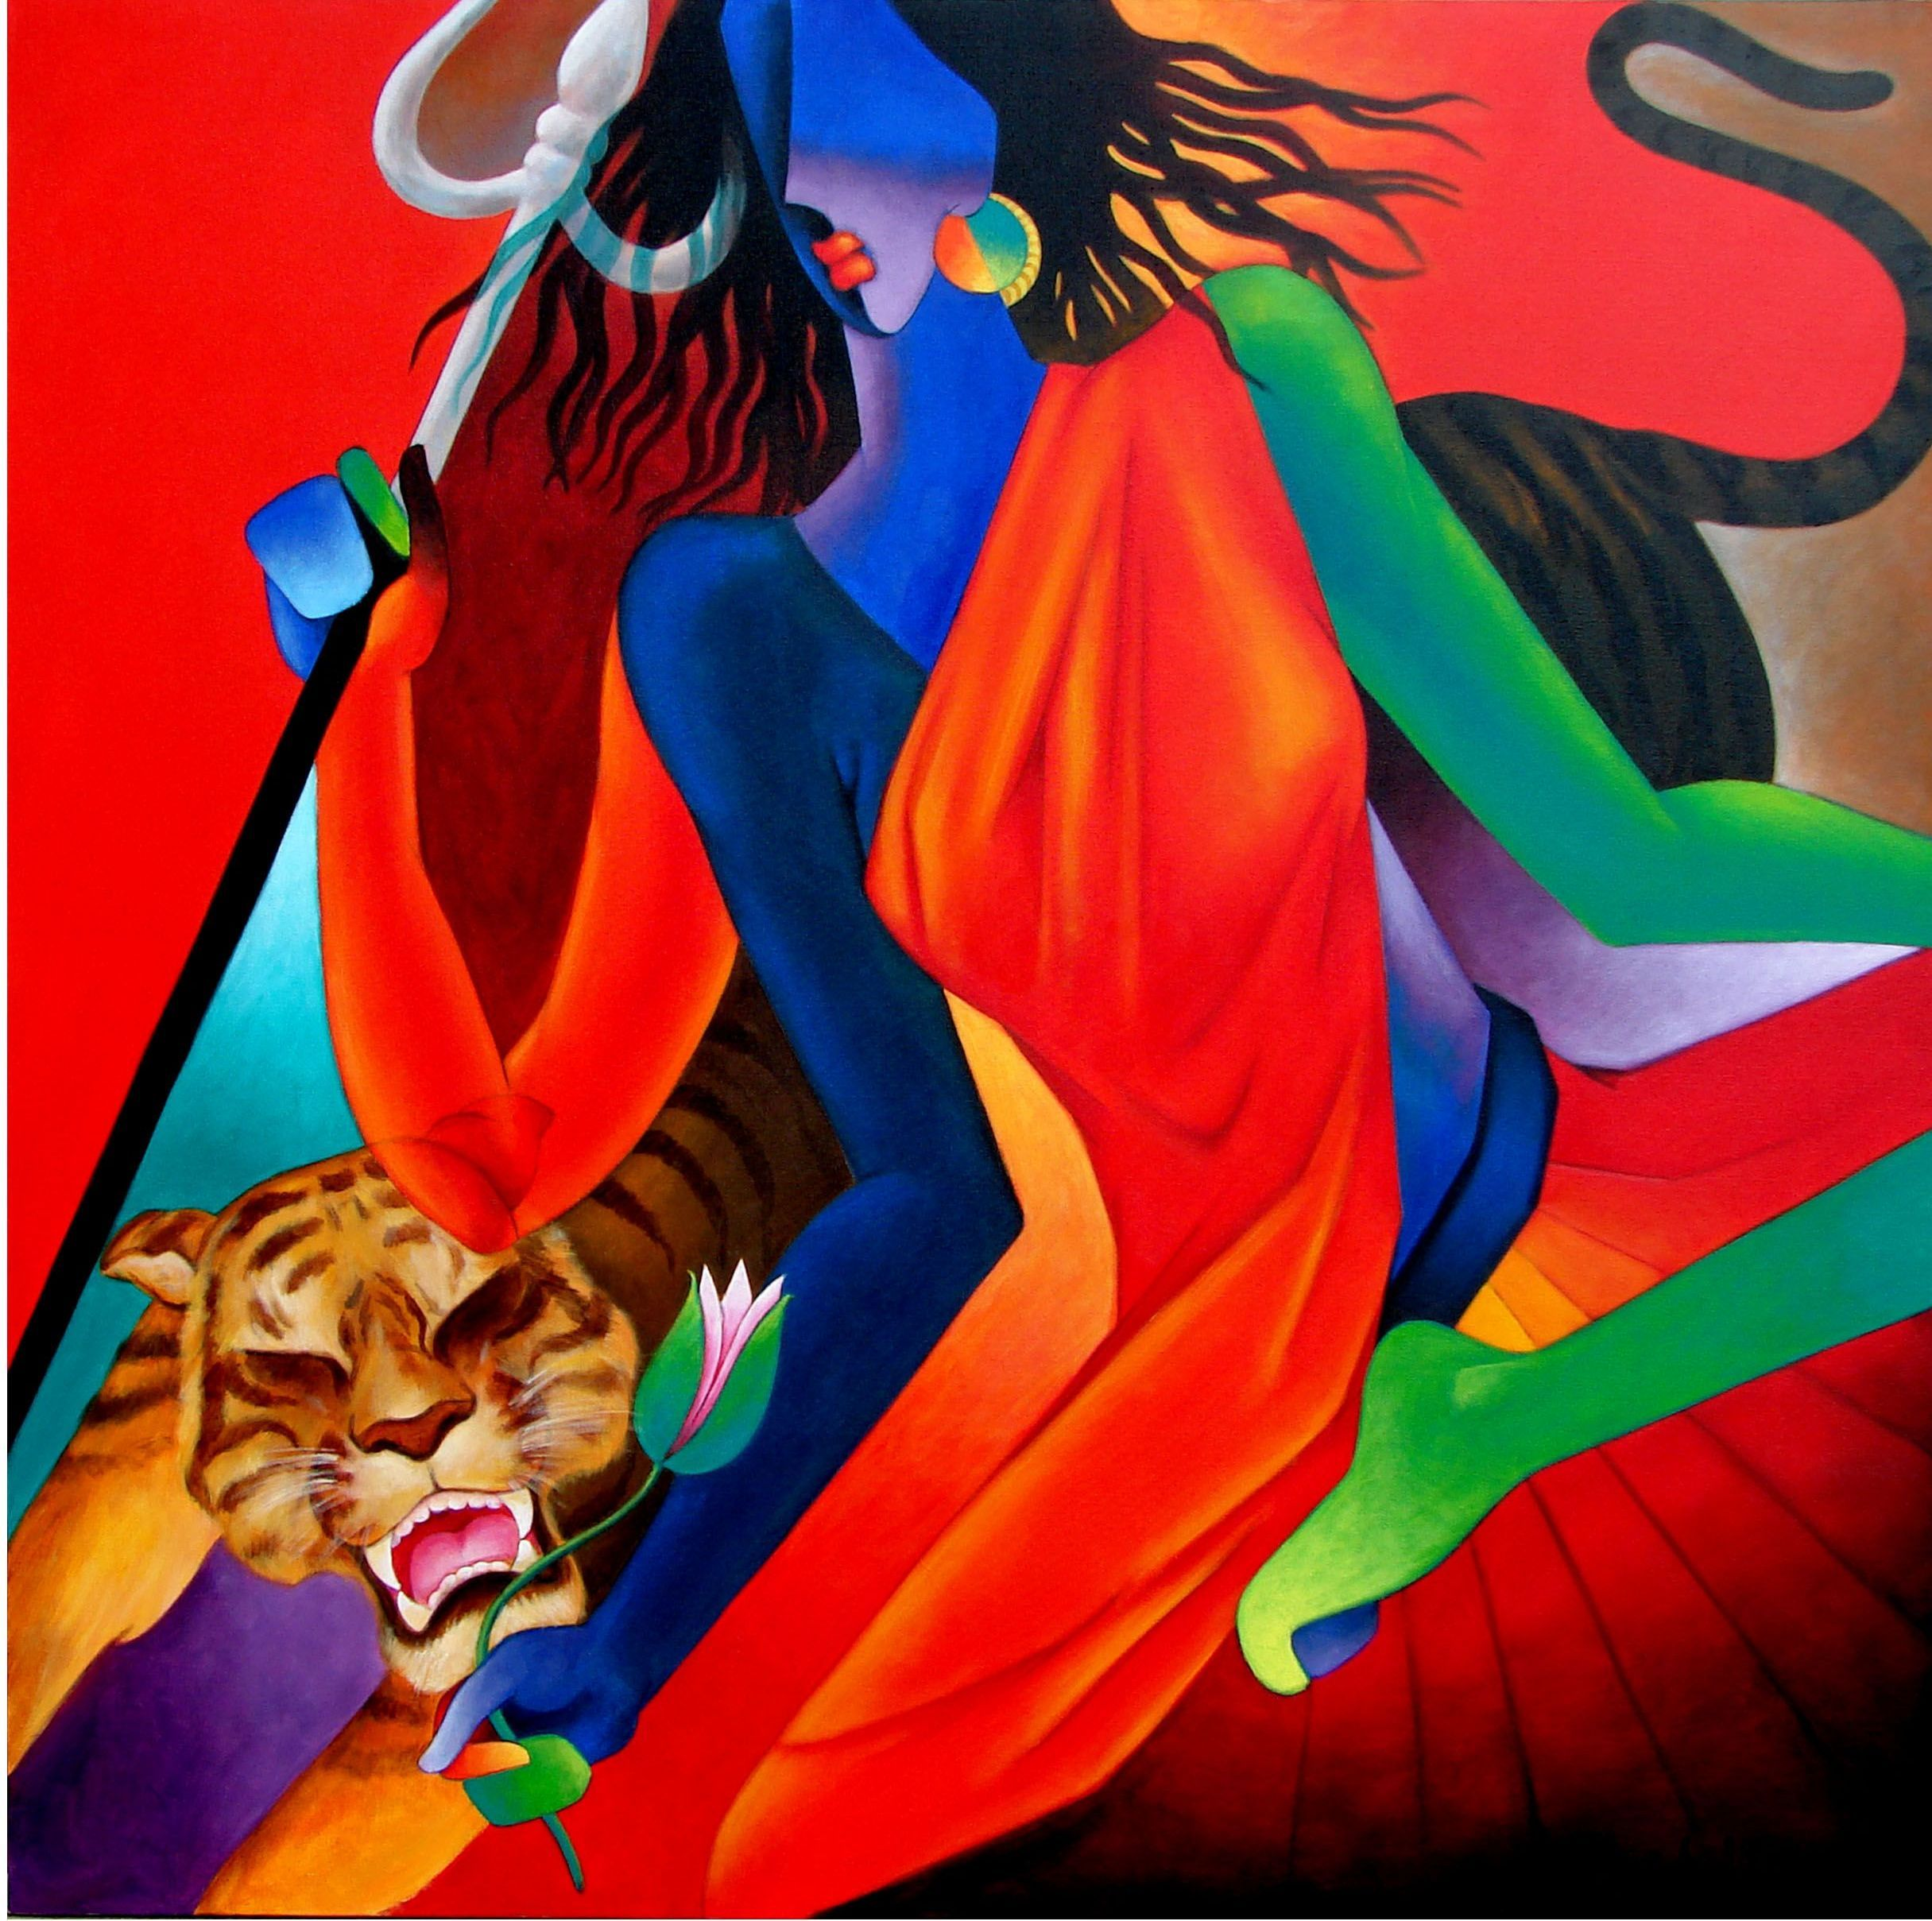 Goddess Durga Painting | Indian Art Online | Pinterest